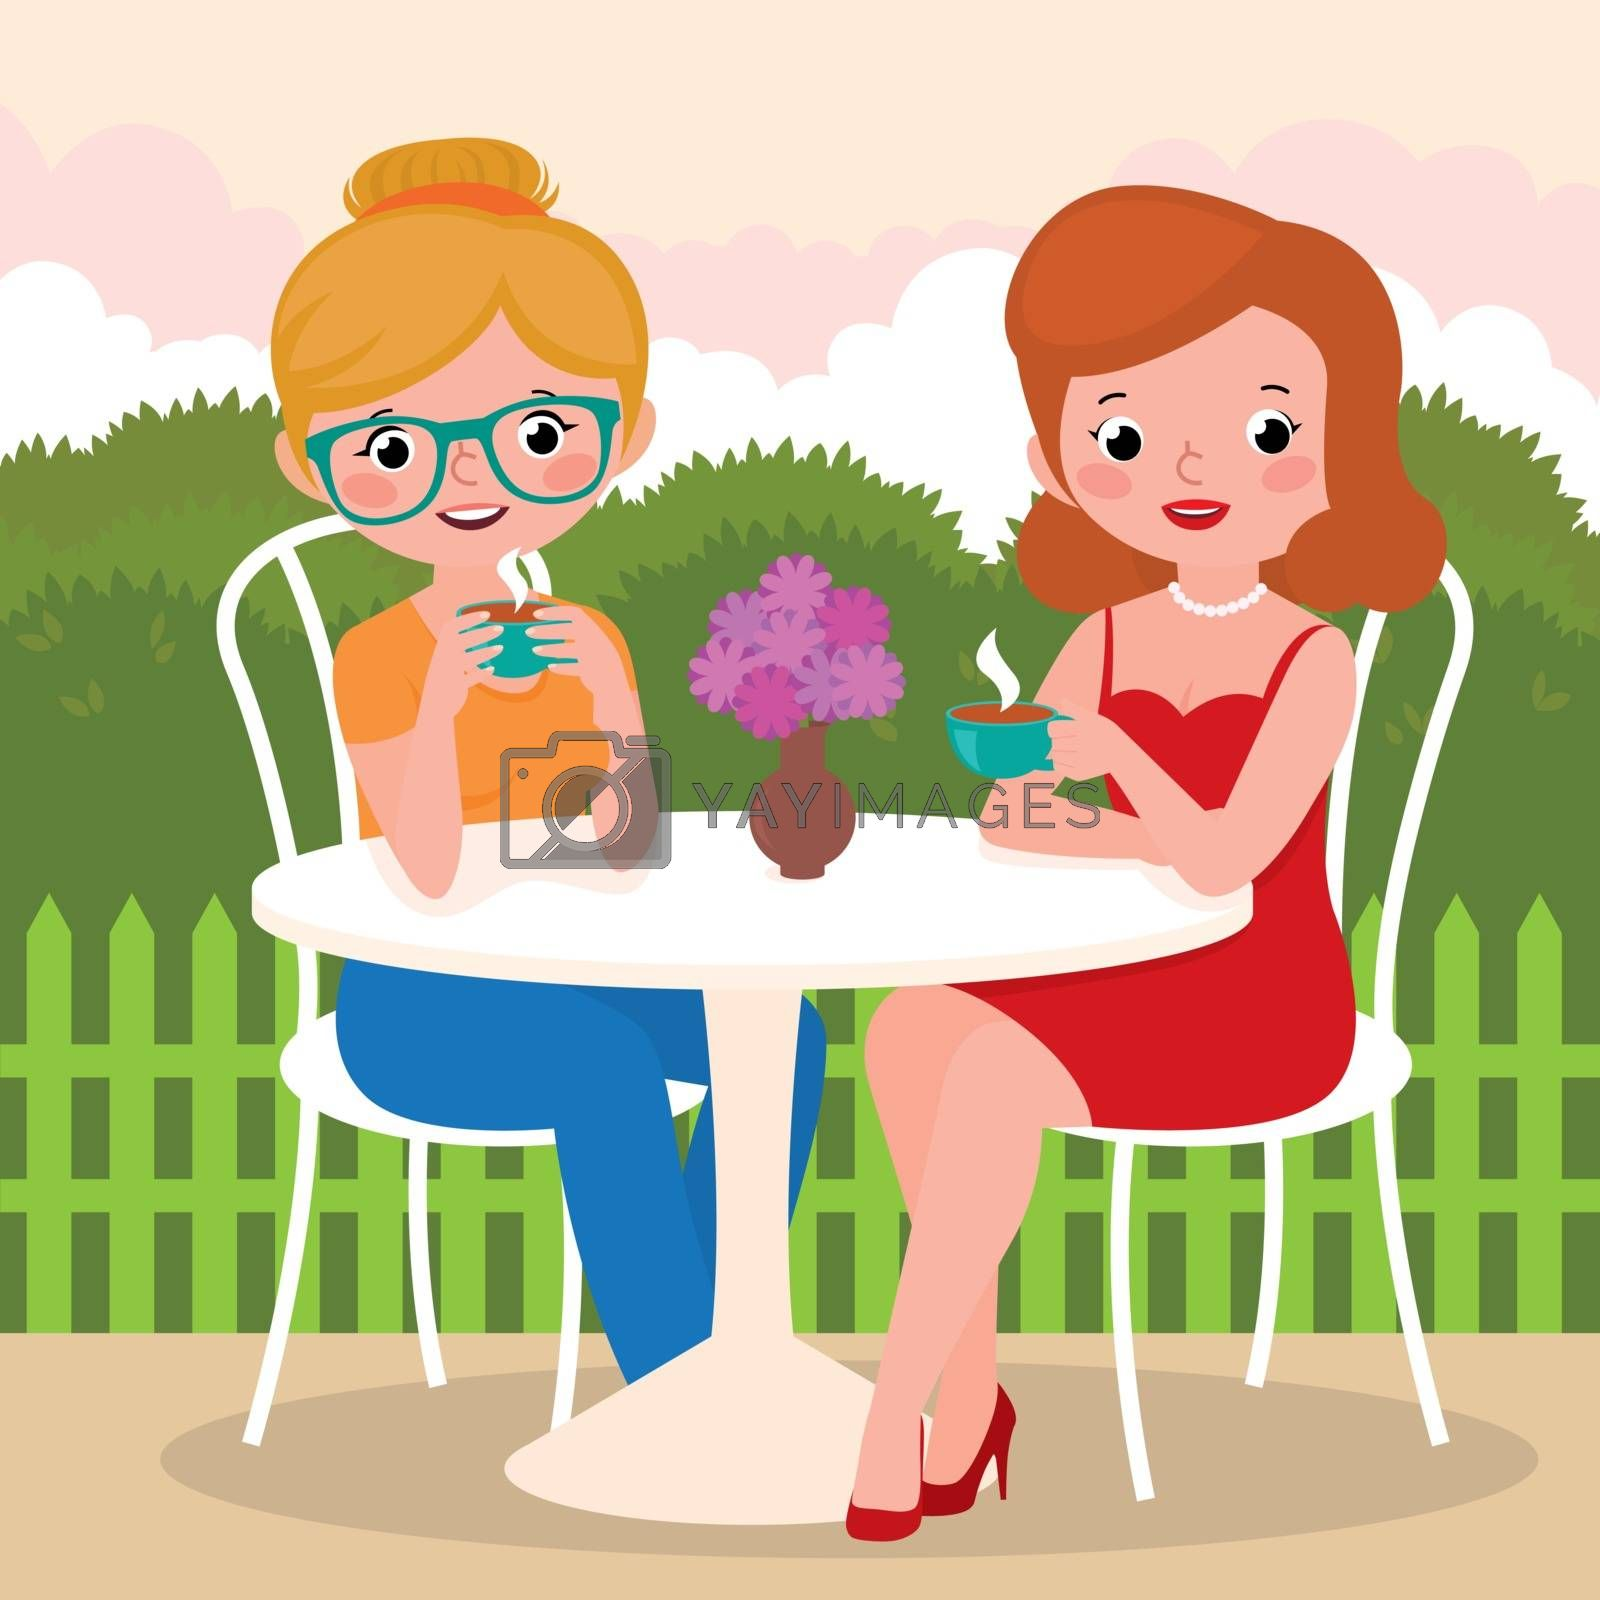 Stock Vector cartoon illustration of a tea party girl friends outdoors